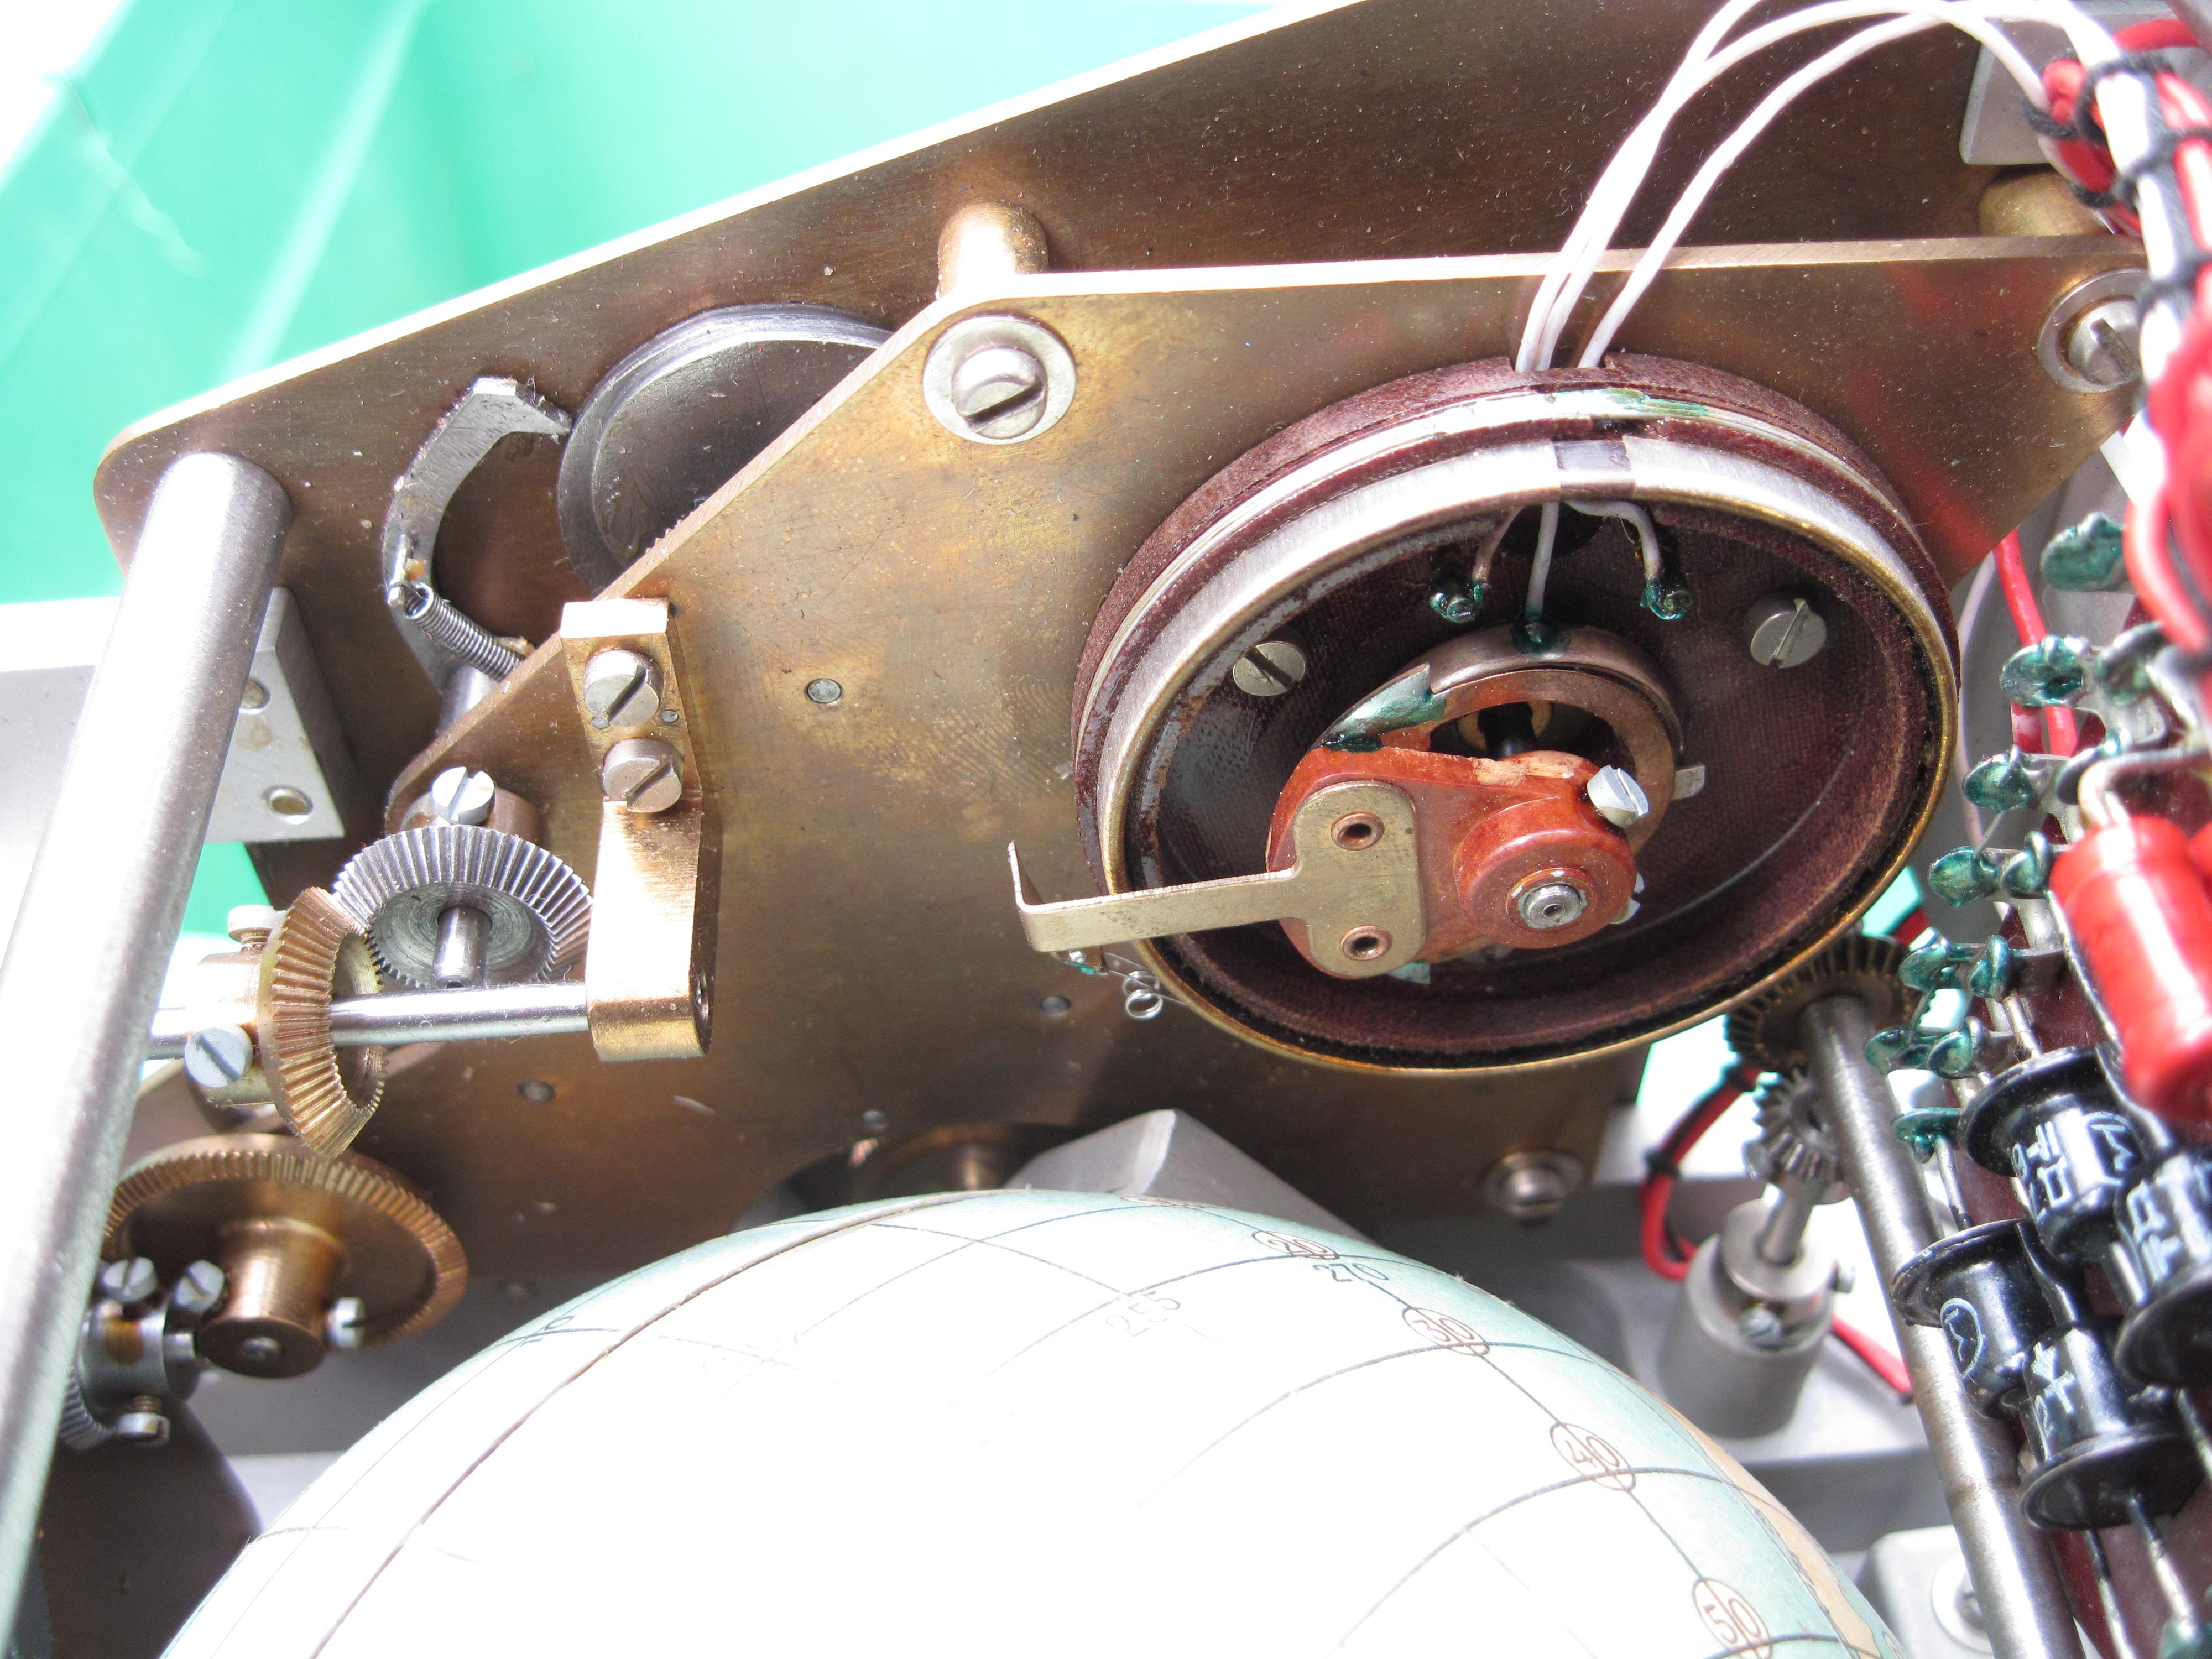 File:Voskhod spacecraft IMP 'Globus' navigation instrument